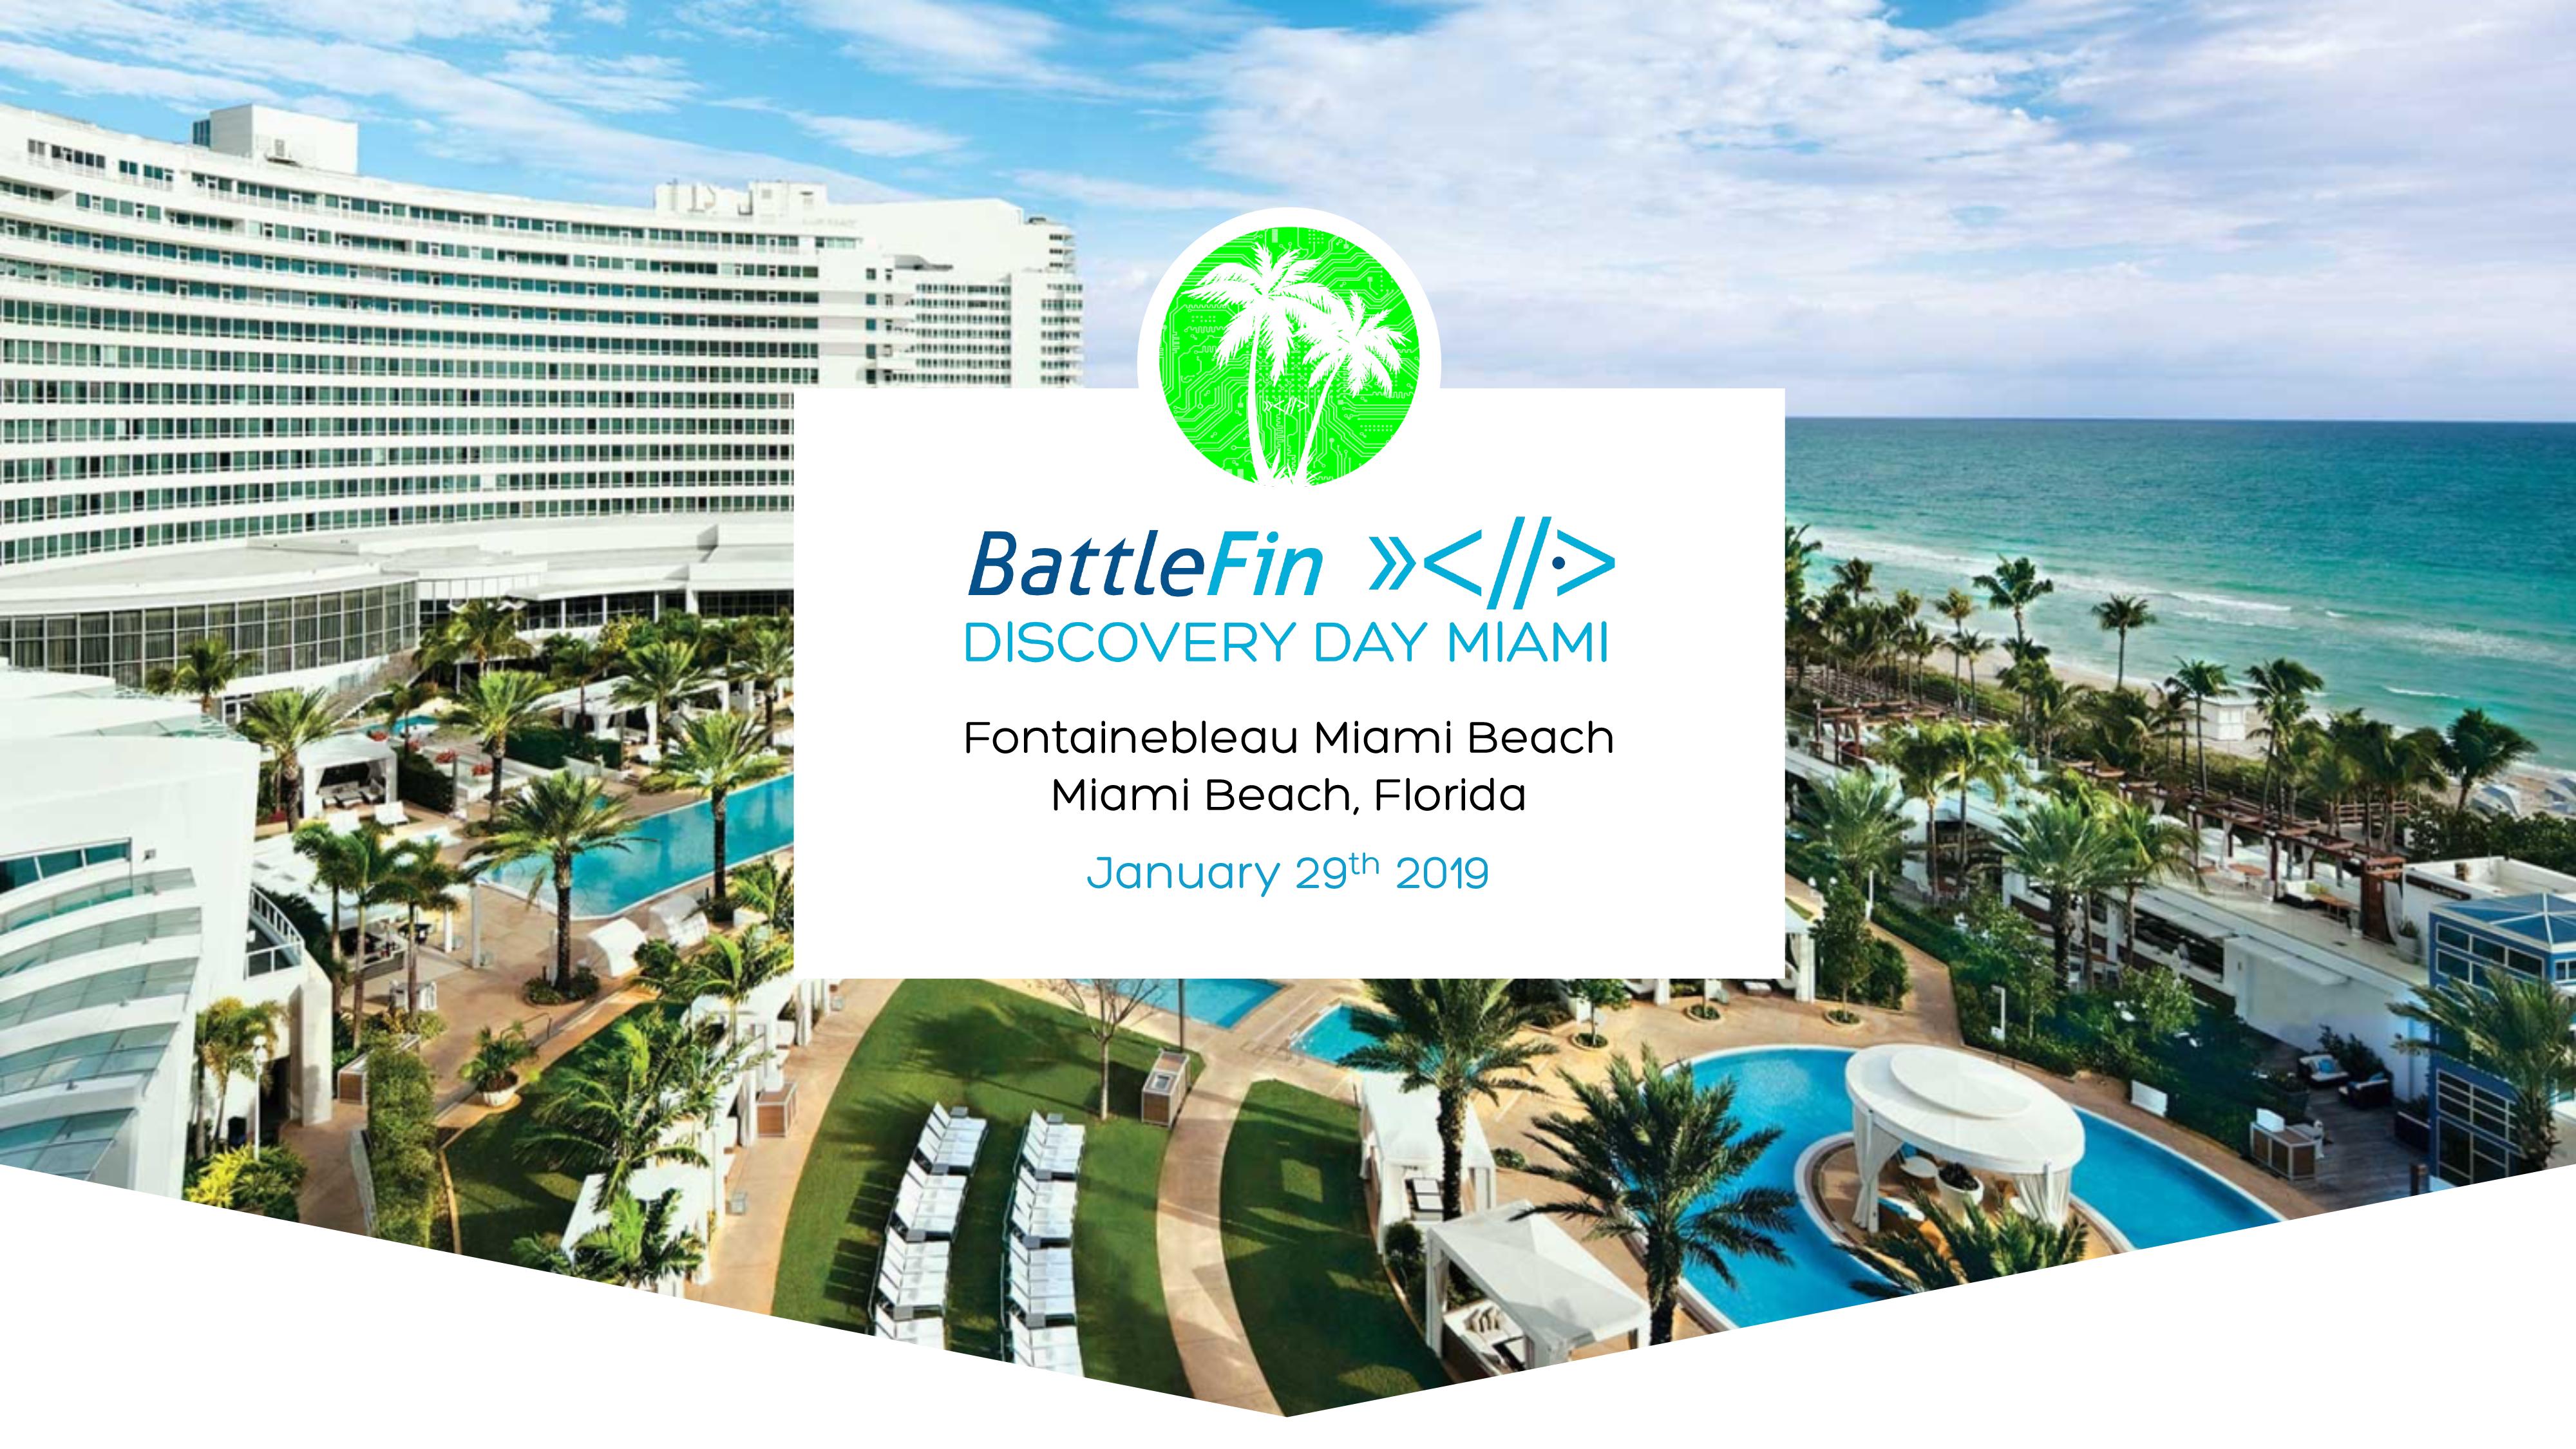 BattleFin-header_LandingPage_v2-01 Miami 2018.png